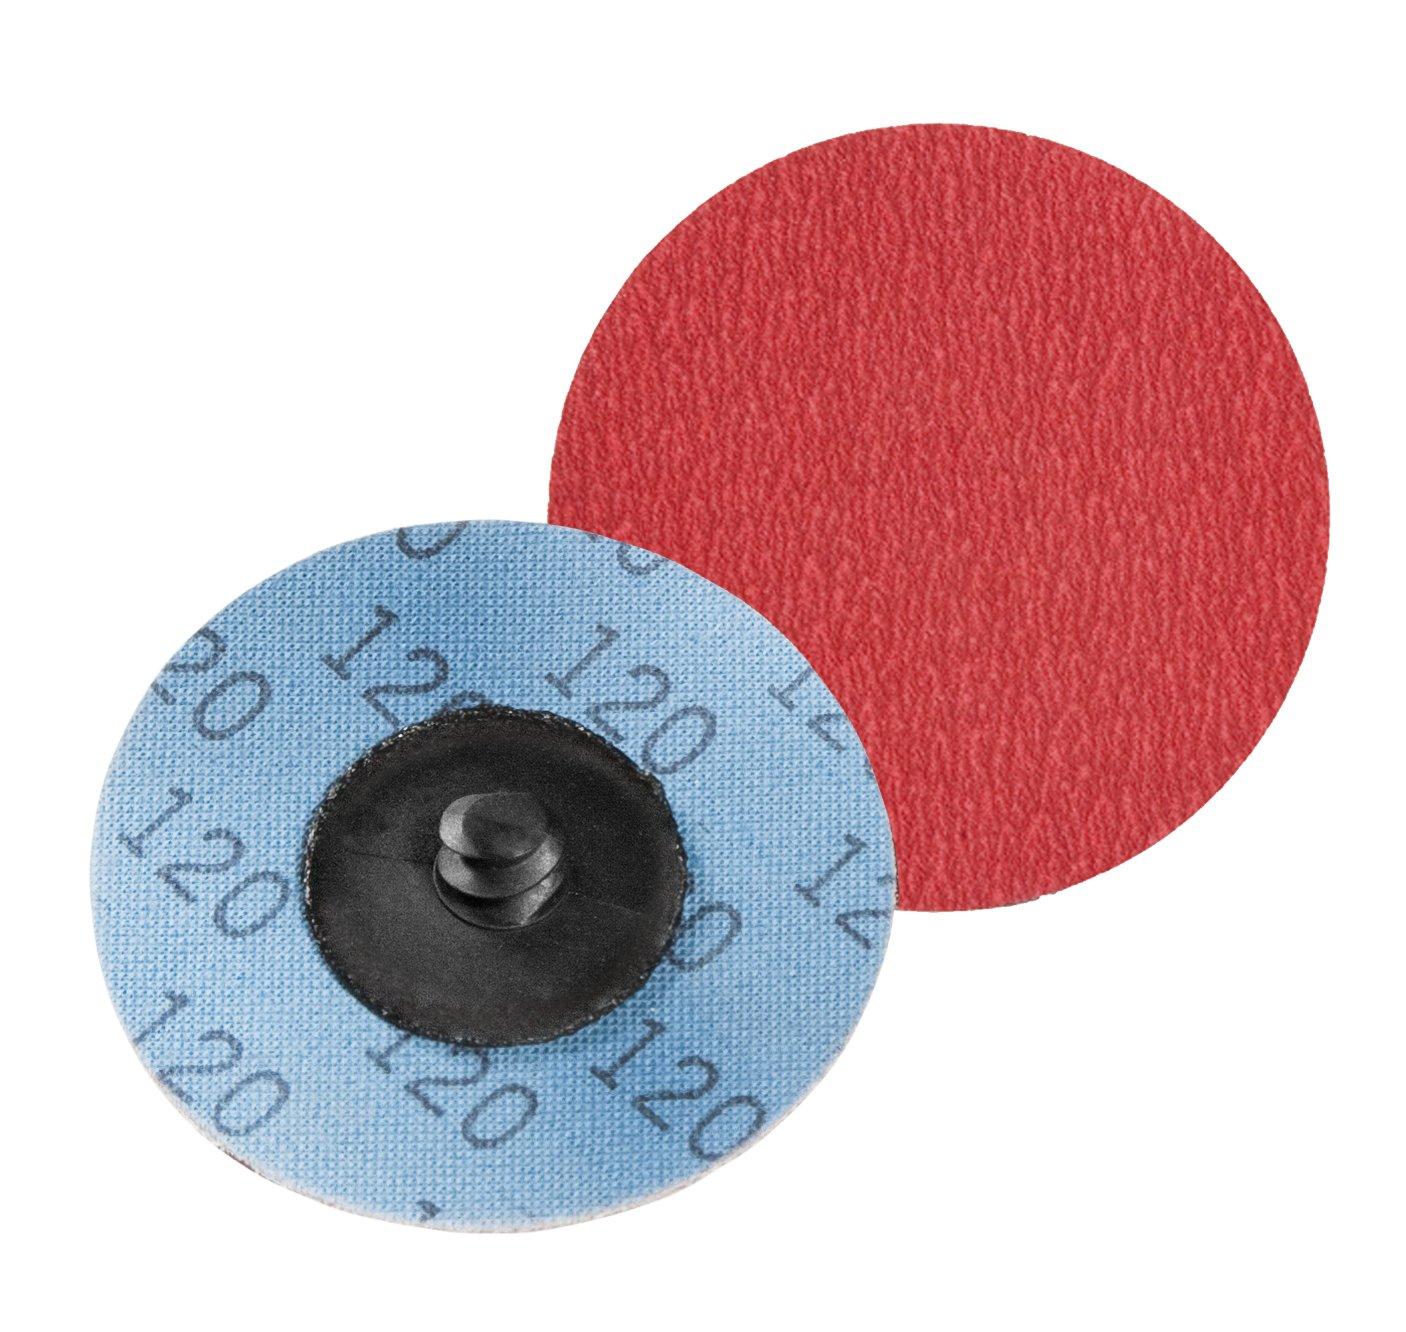 Type R VSM 148880 2 Quick Change Disc VSM Abrasives Co. Series XK870X Roll On Pack of 25 Ceramic 60G